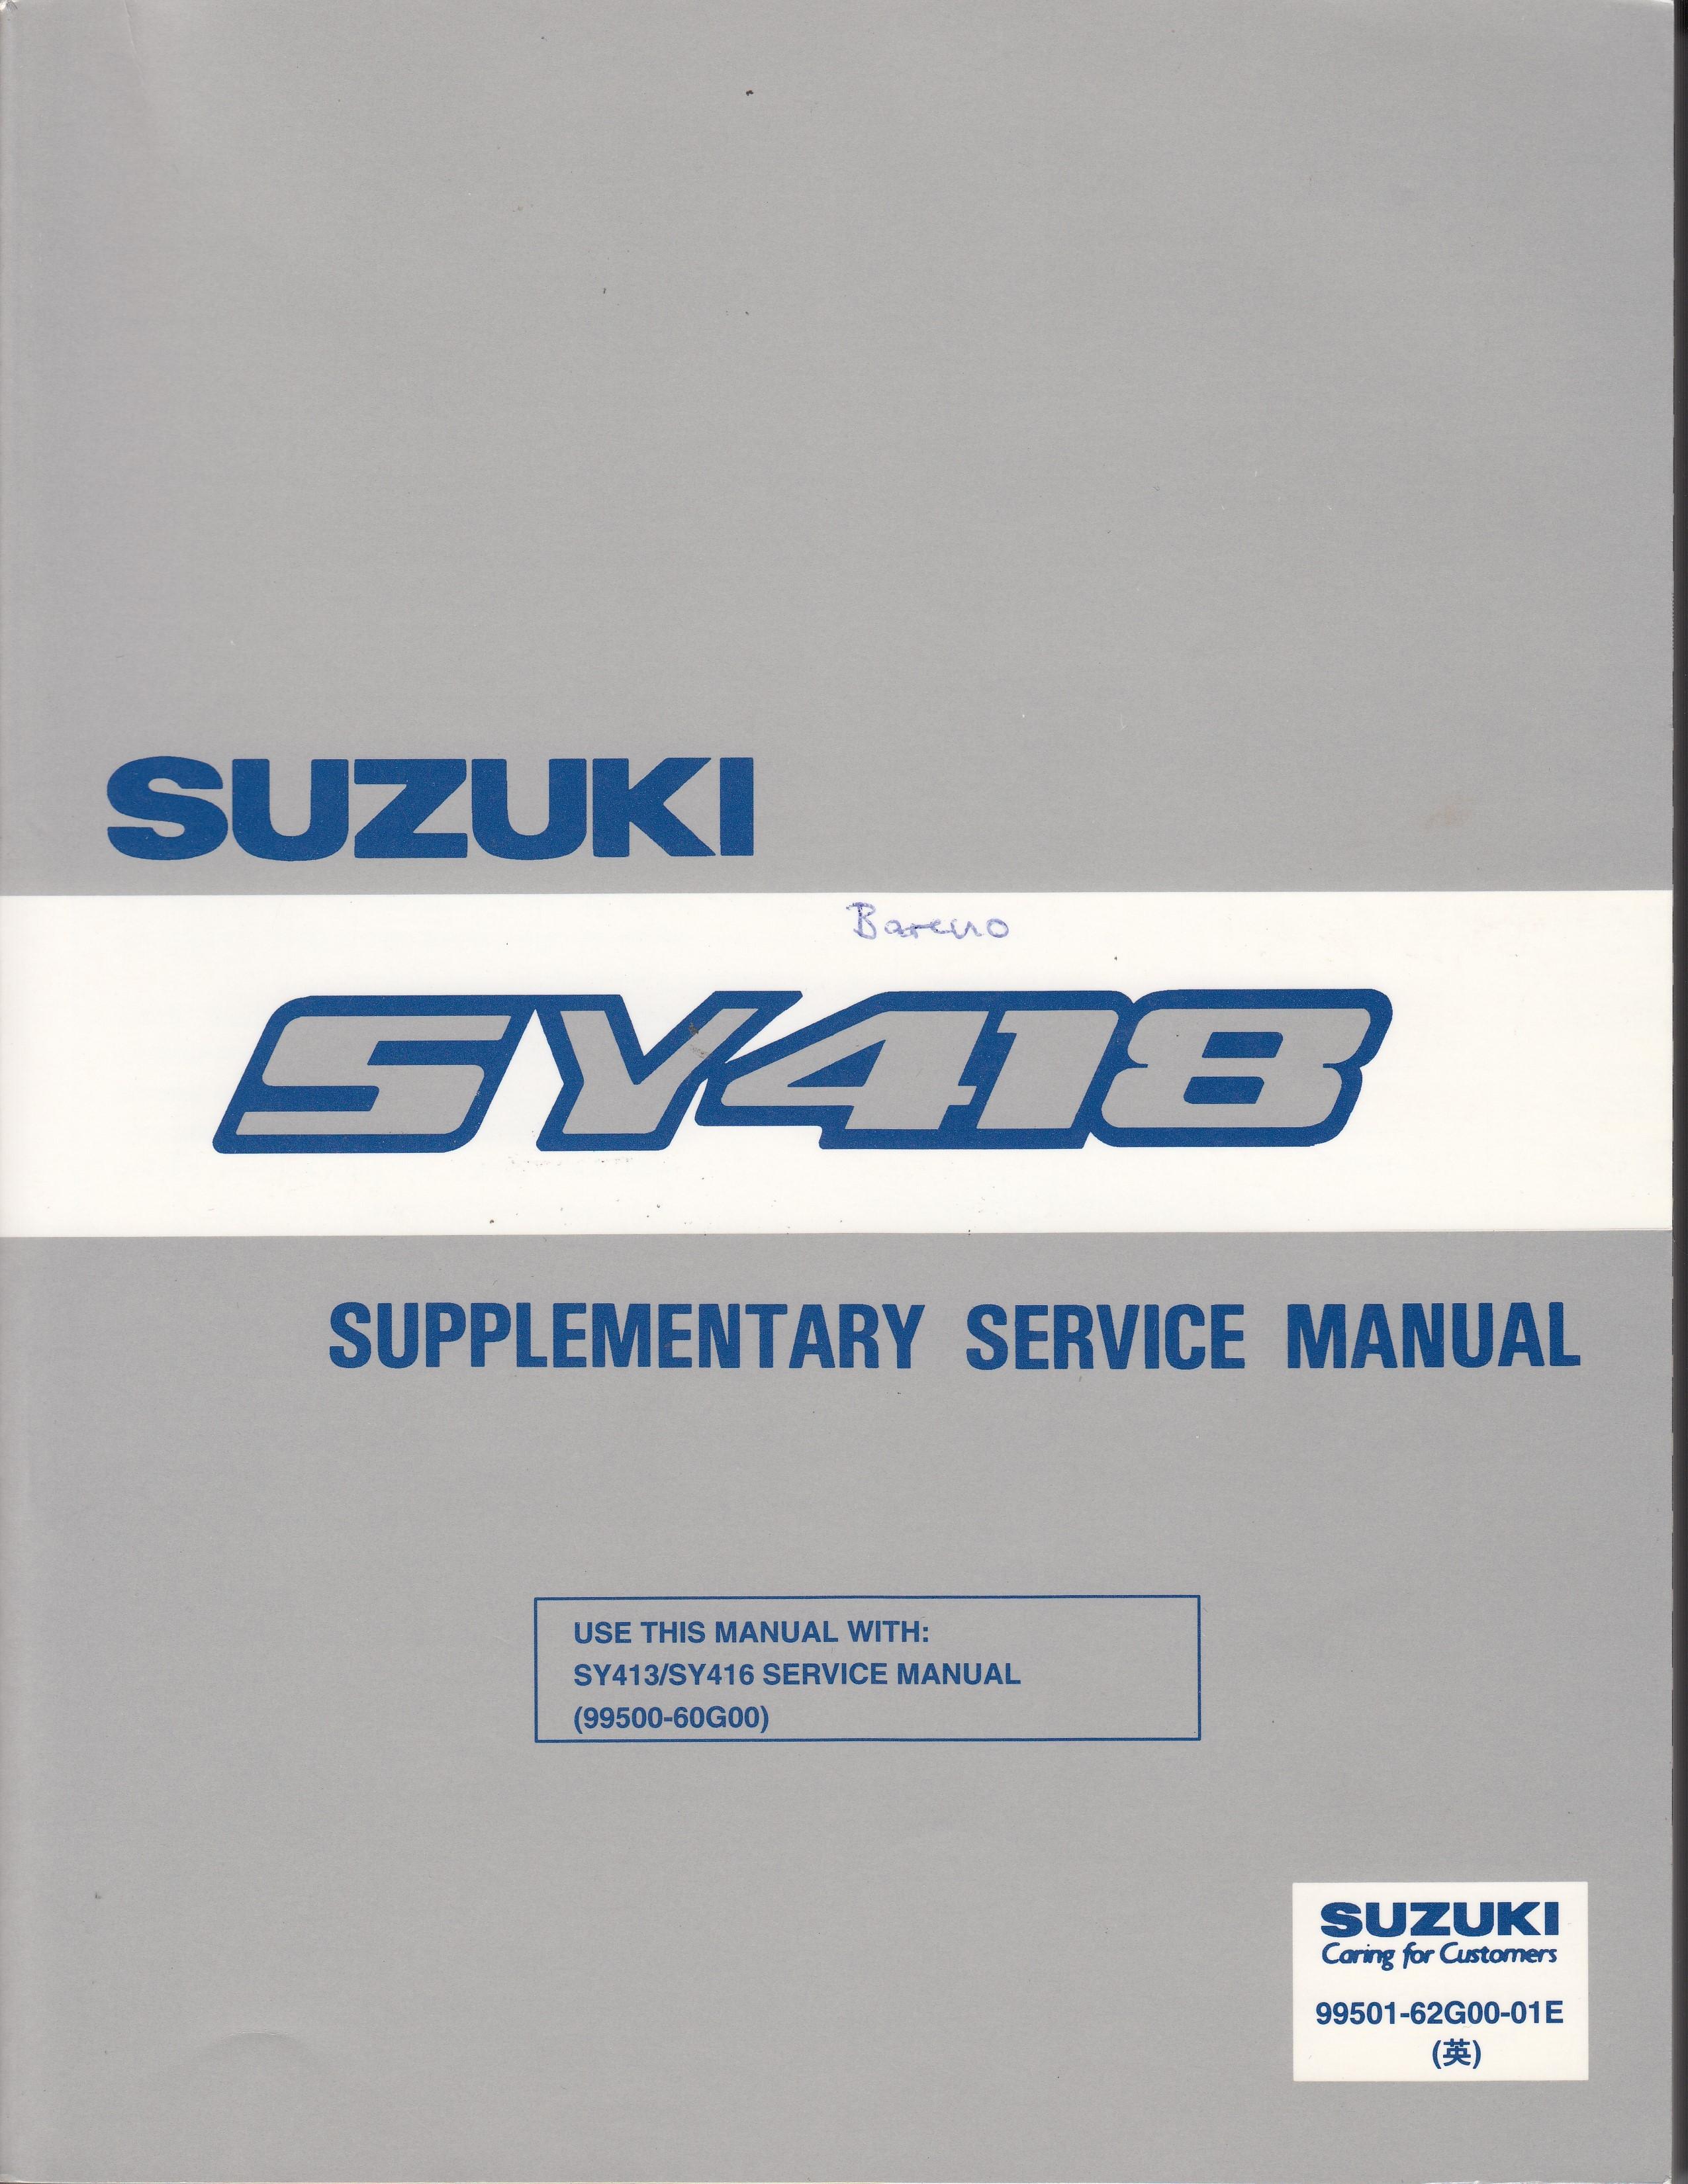 Suzuki Baleno (95-01) - Supplementary Service Manual SY 418